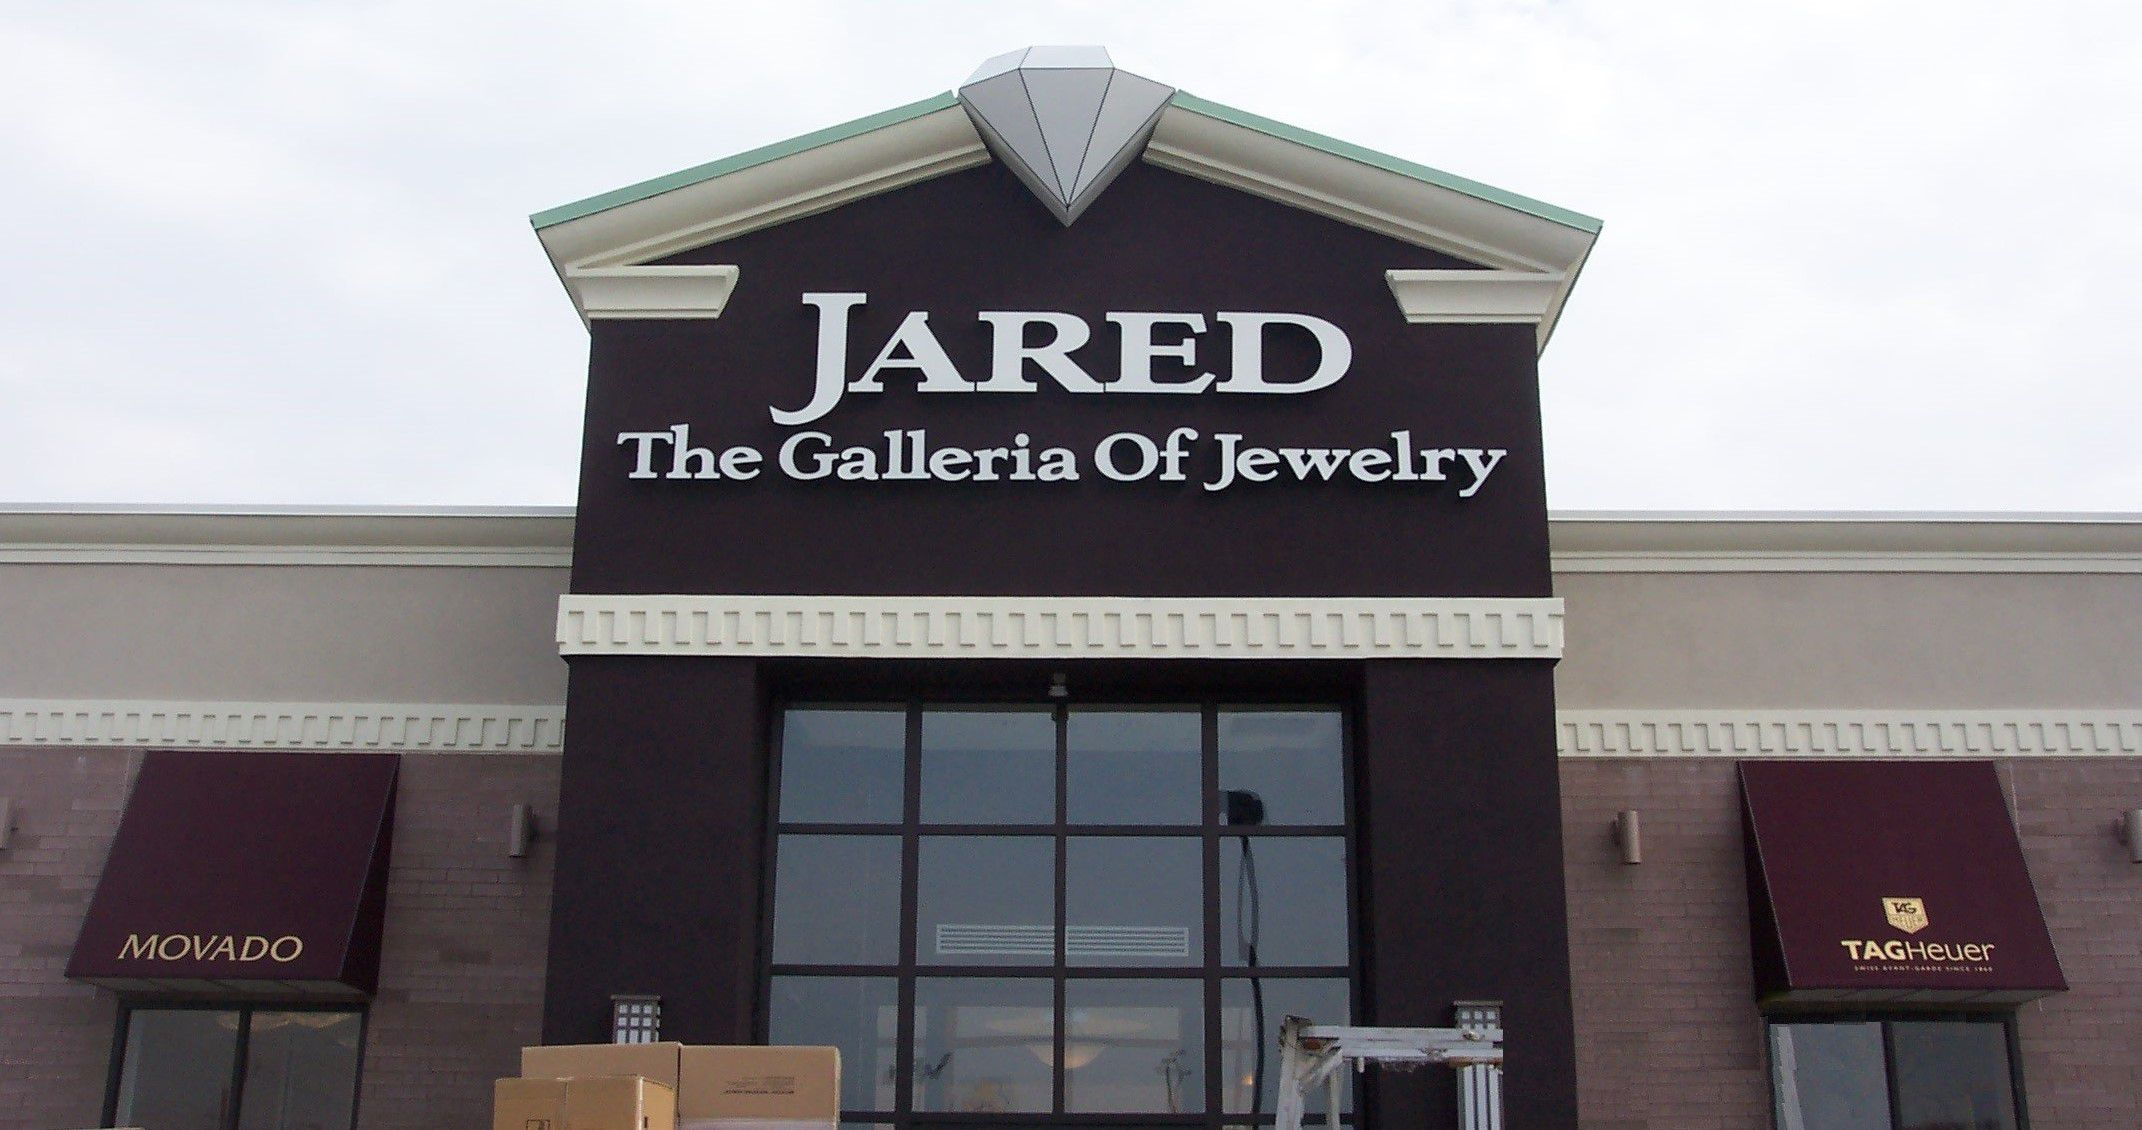 Image of Jared